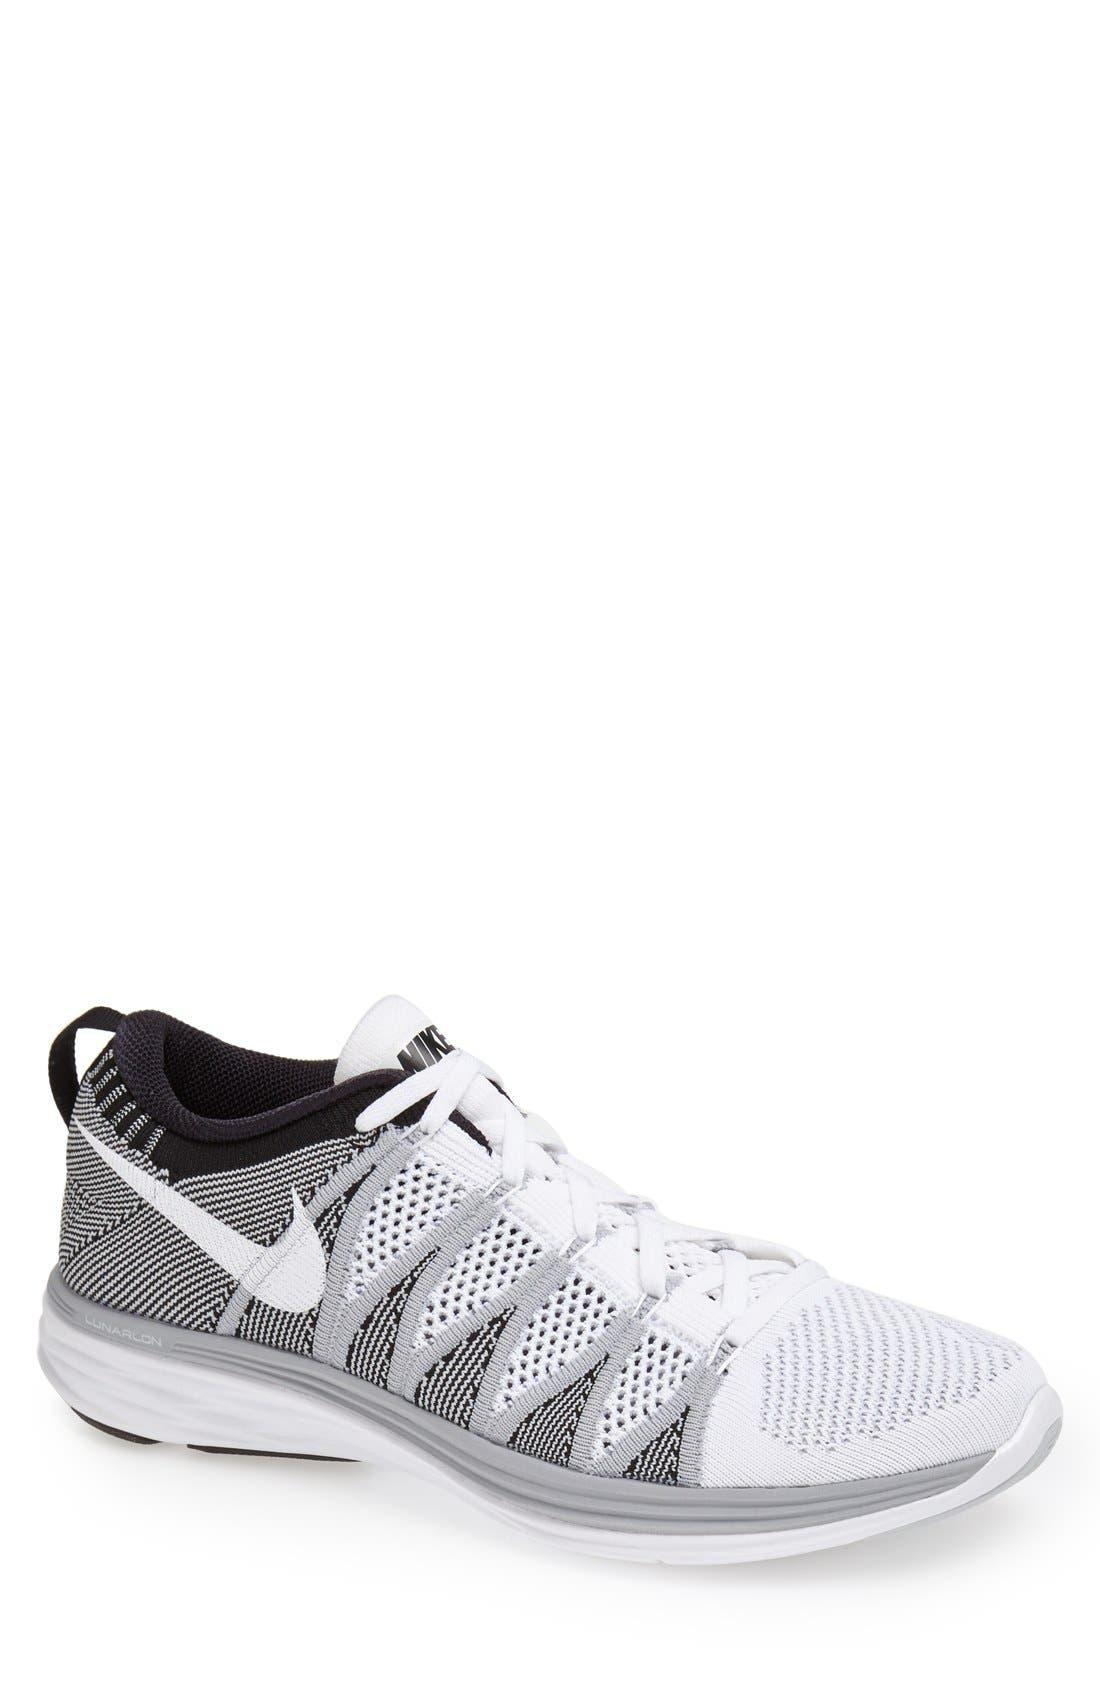 Alternate Image 1 Selected - Nike 'Flyknit Lunar2' Running Shoe (Men)